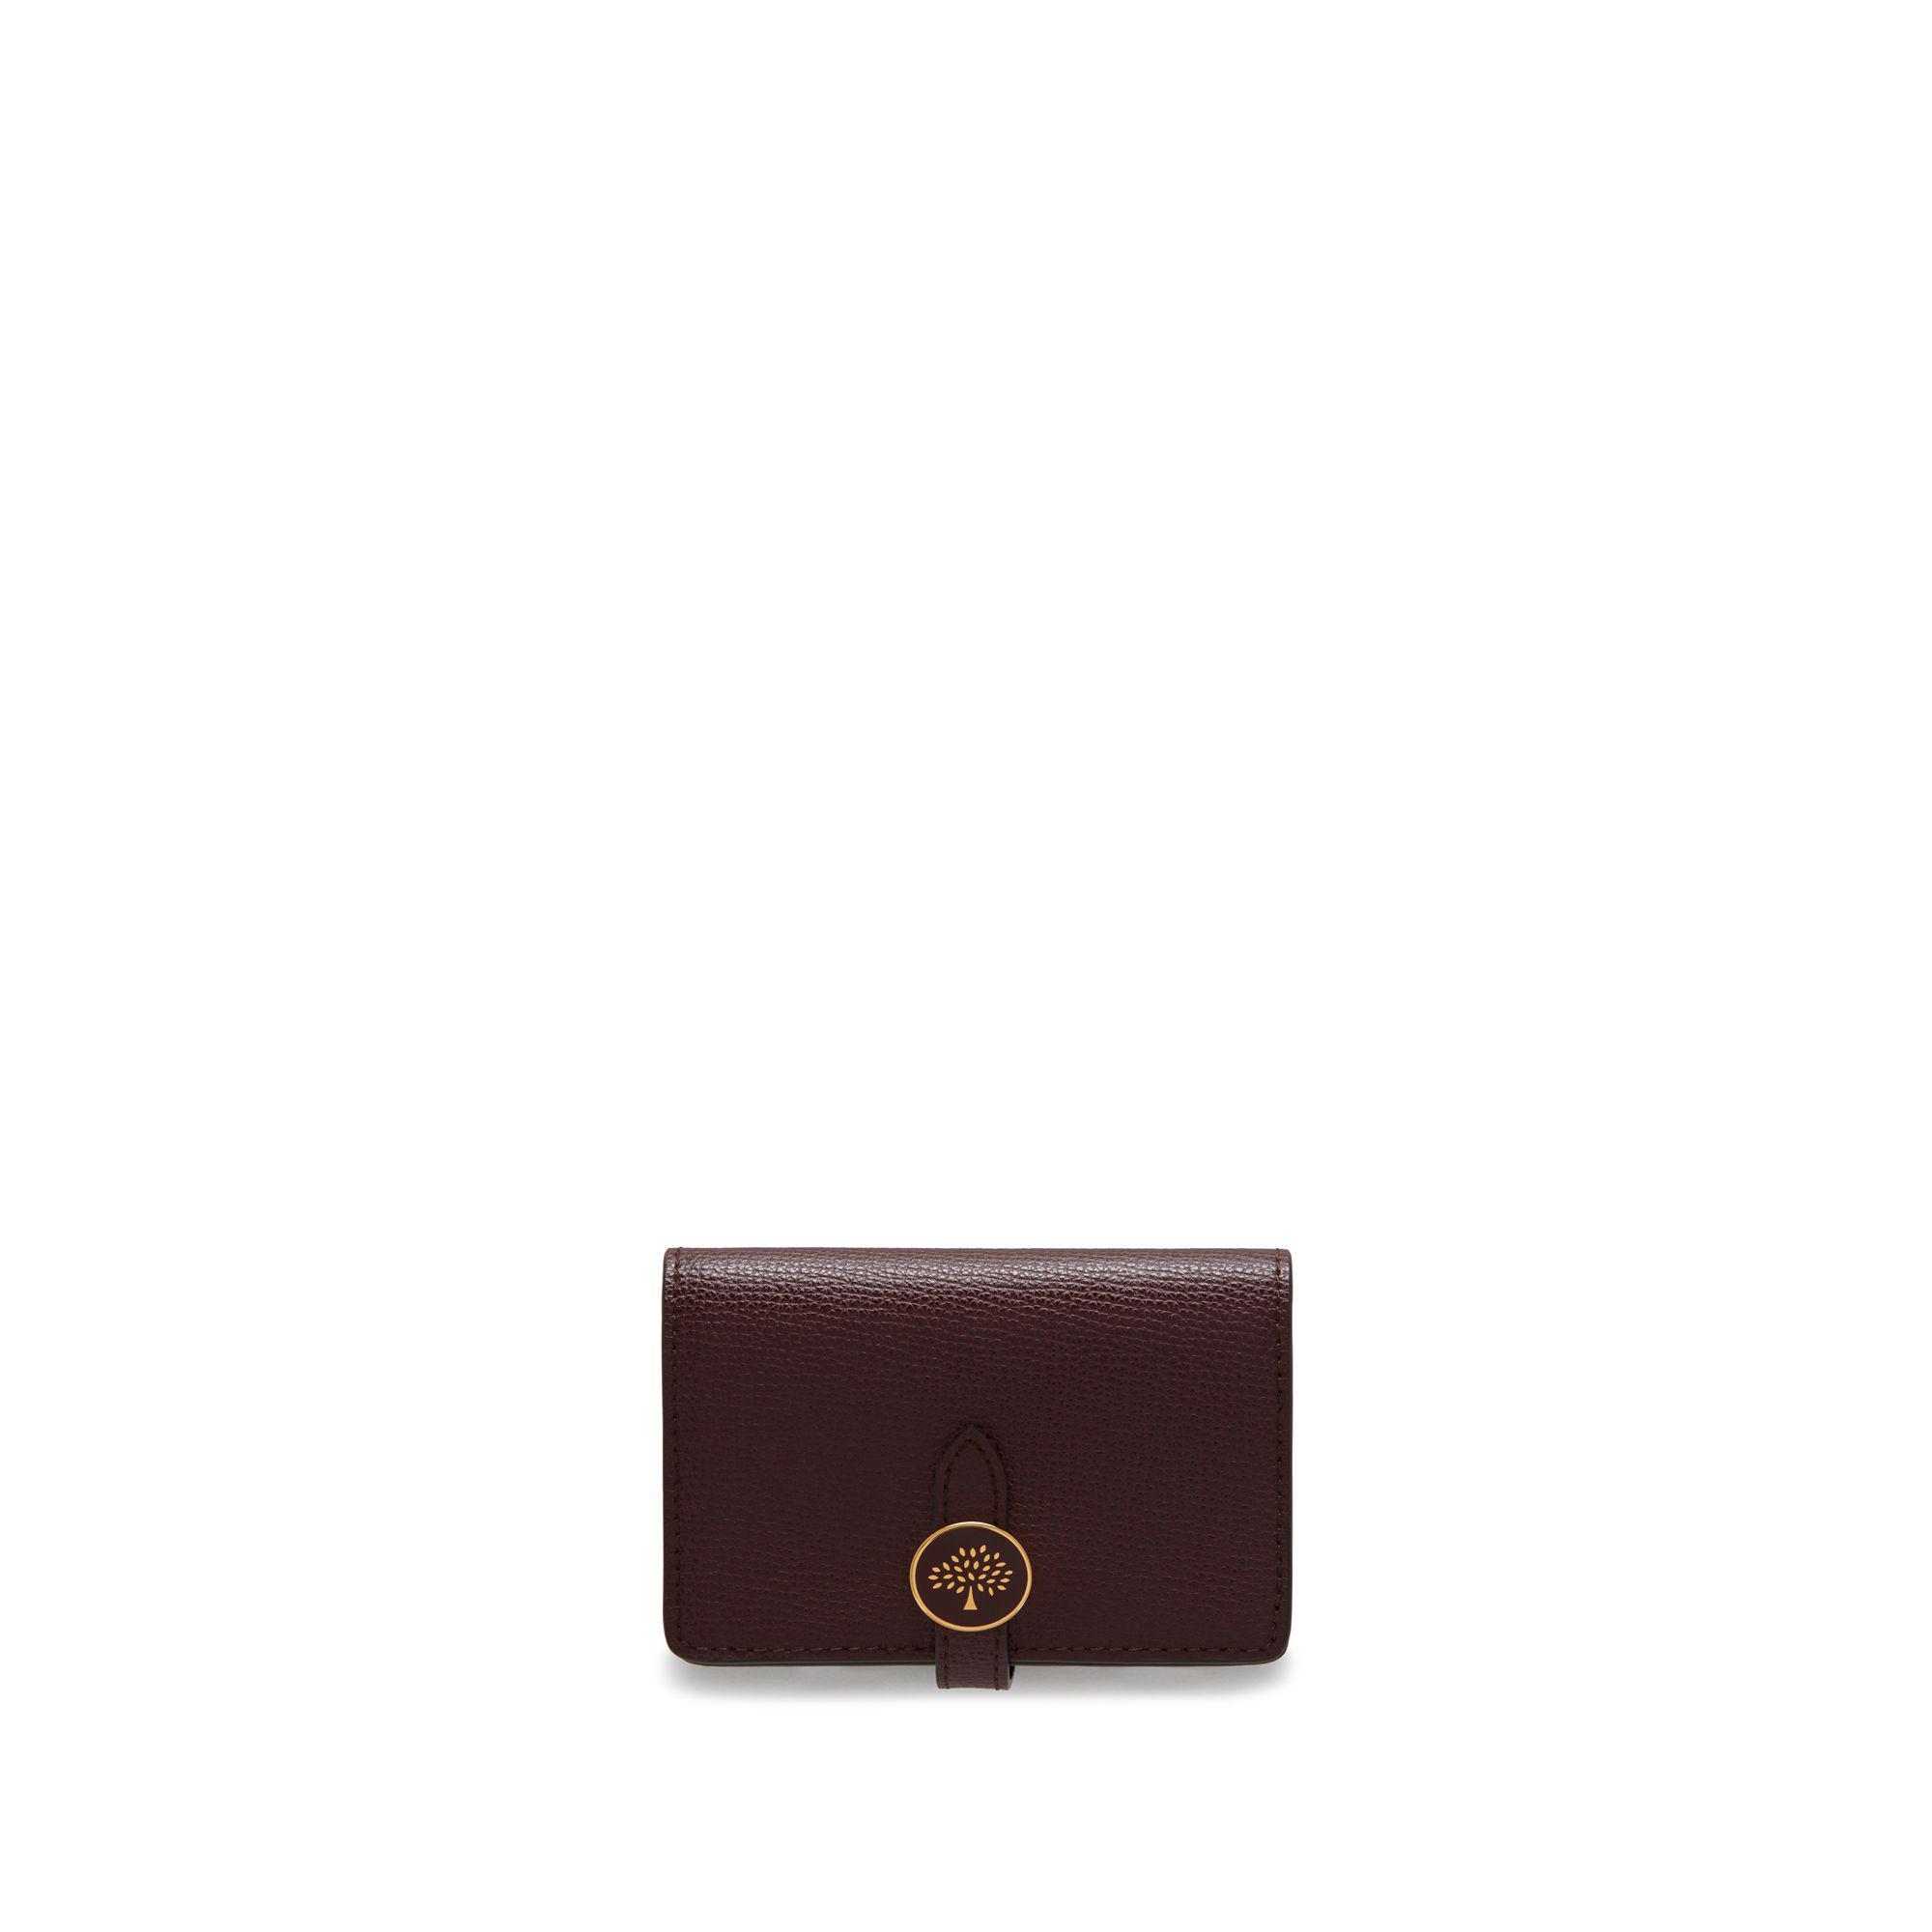 064818c799 Mulberry Tree Card Holder Wallet In Oxblood Cross Grain Leather in ...